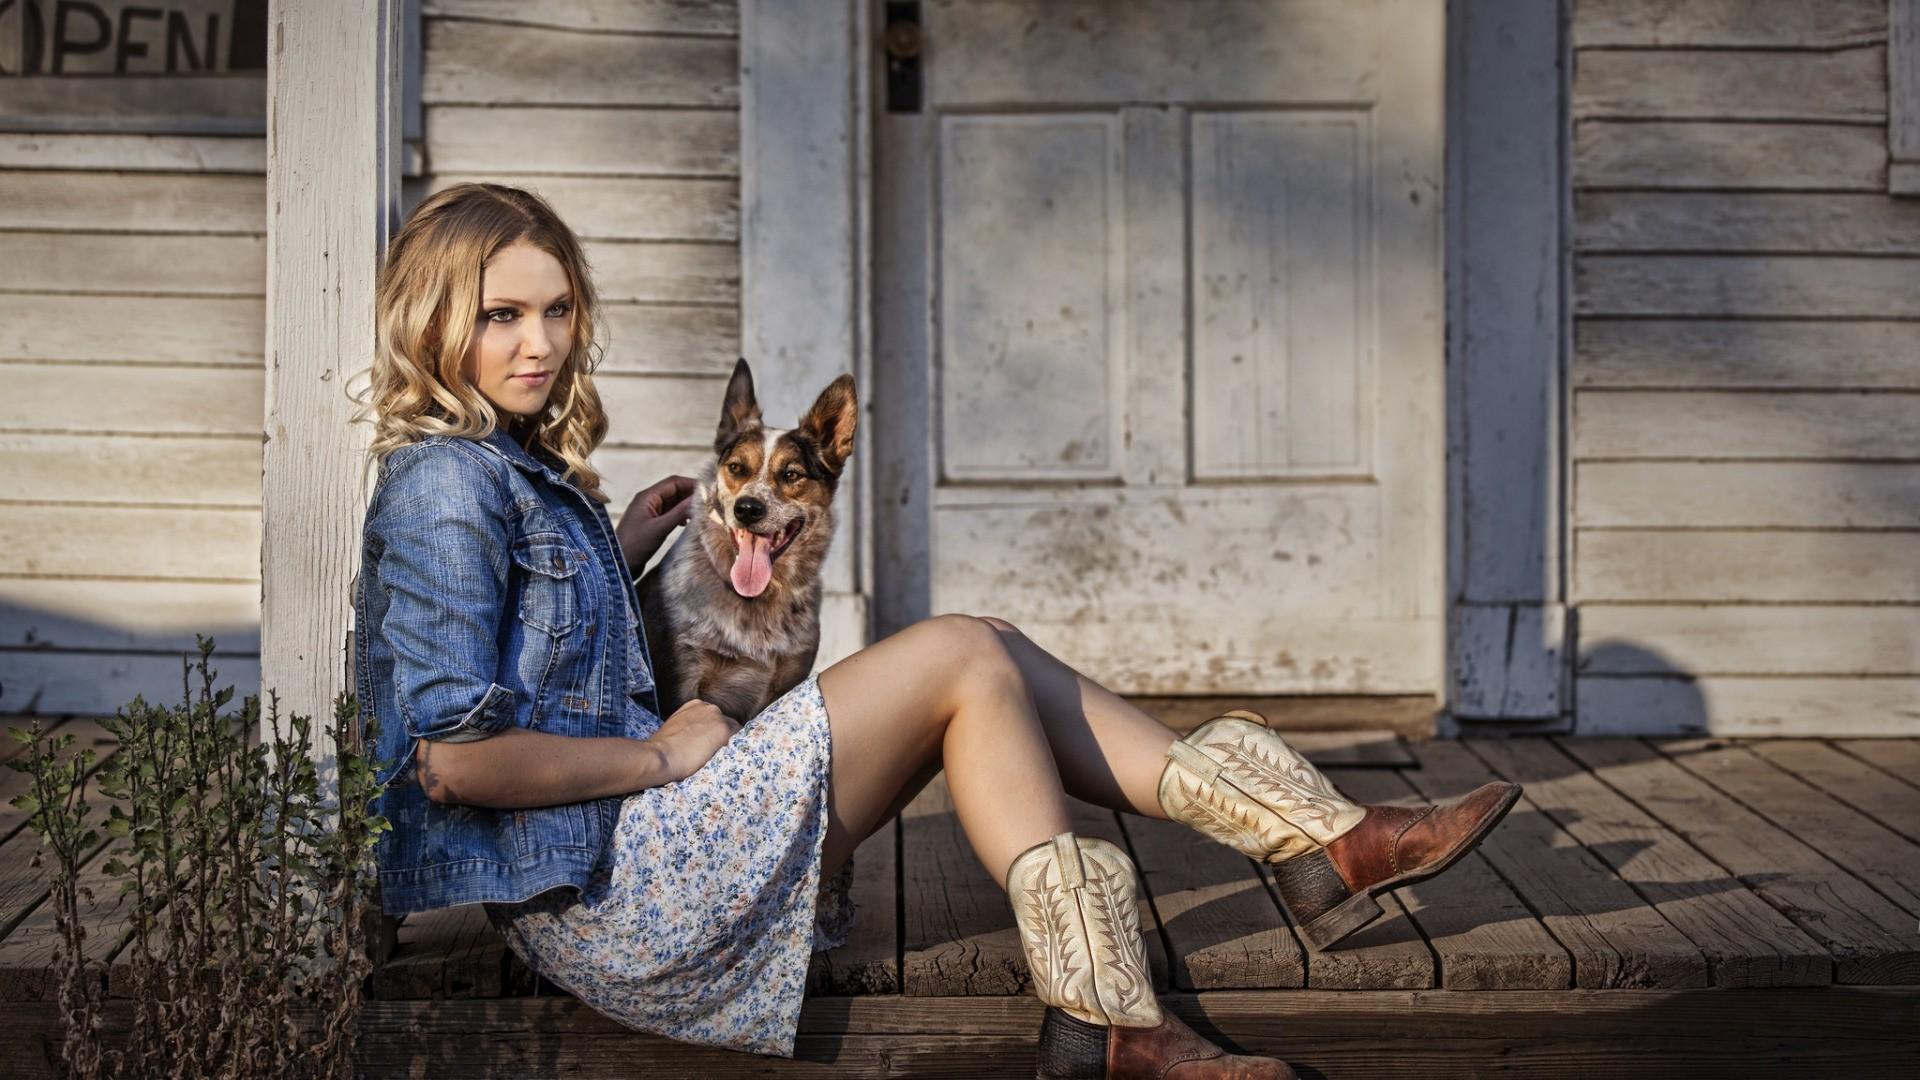 Country Girl hd desktop wallpaper